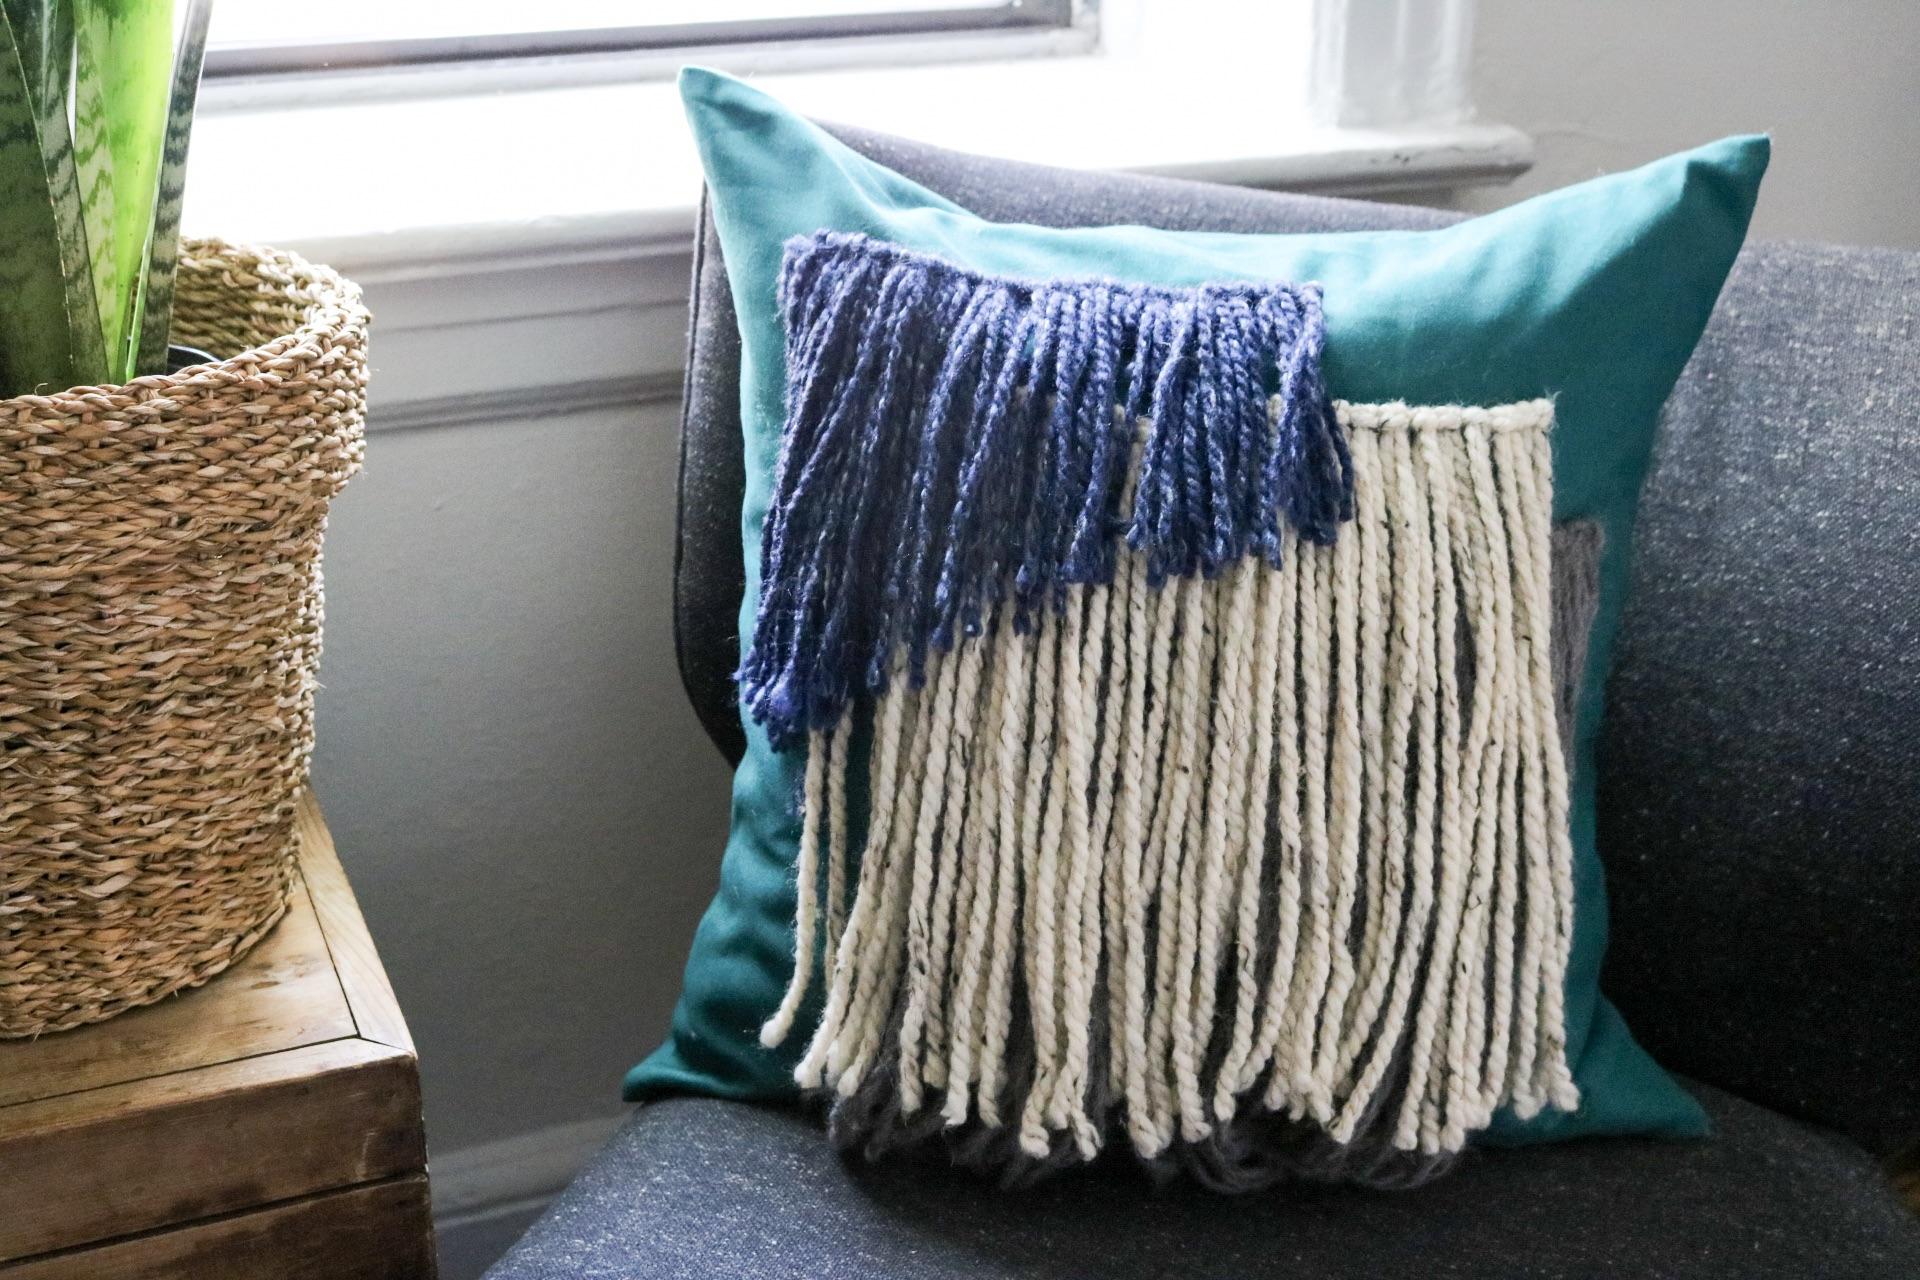 DIY Shag Pillow Cover #boho #bohostyle #yarnwallhaning #pillowcoverdiy #pillowcover #livingroomdecor #livingroom #yarn #yarnprojects